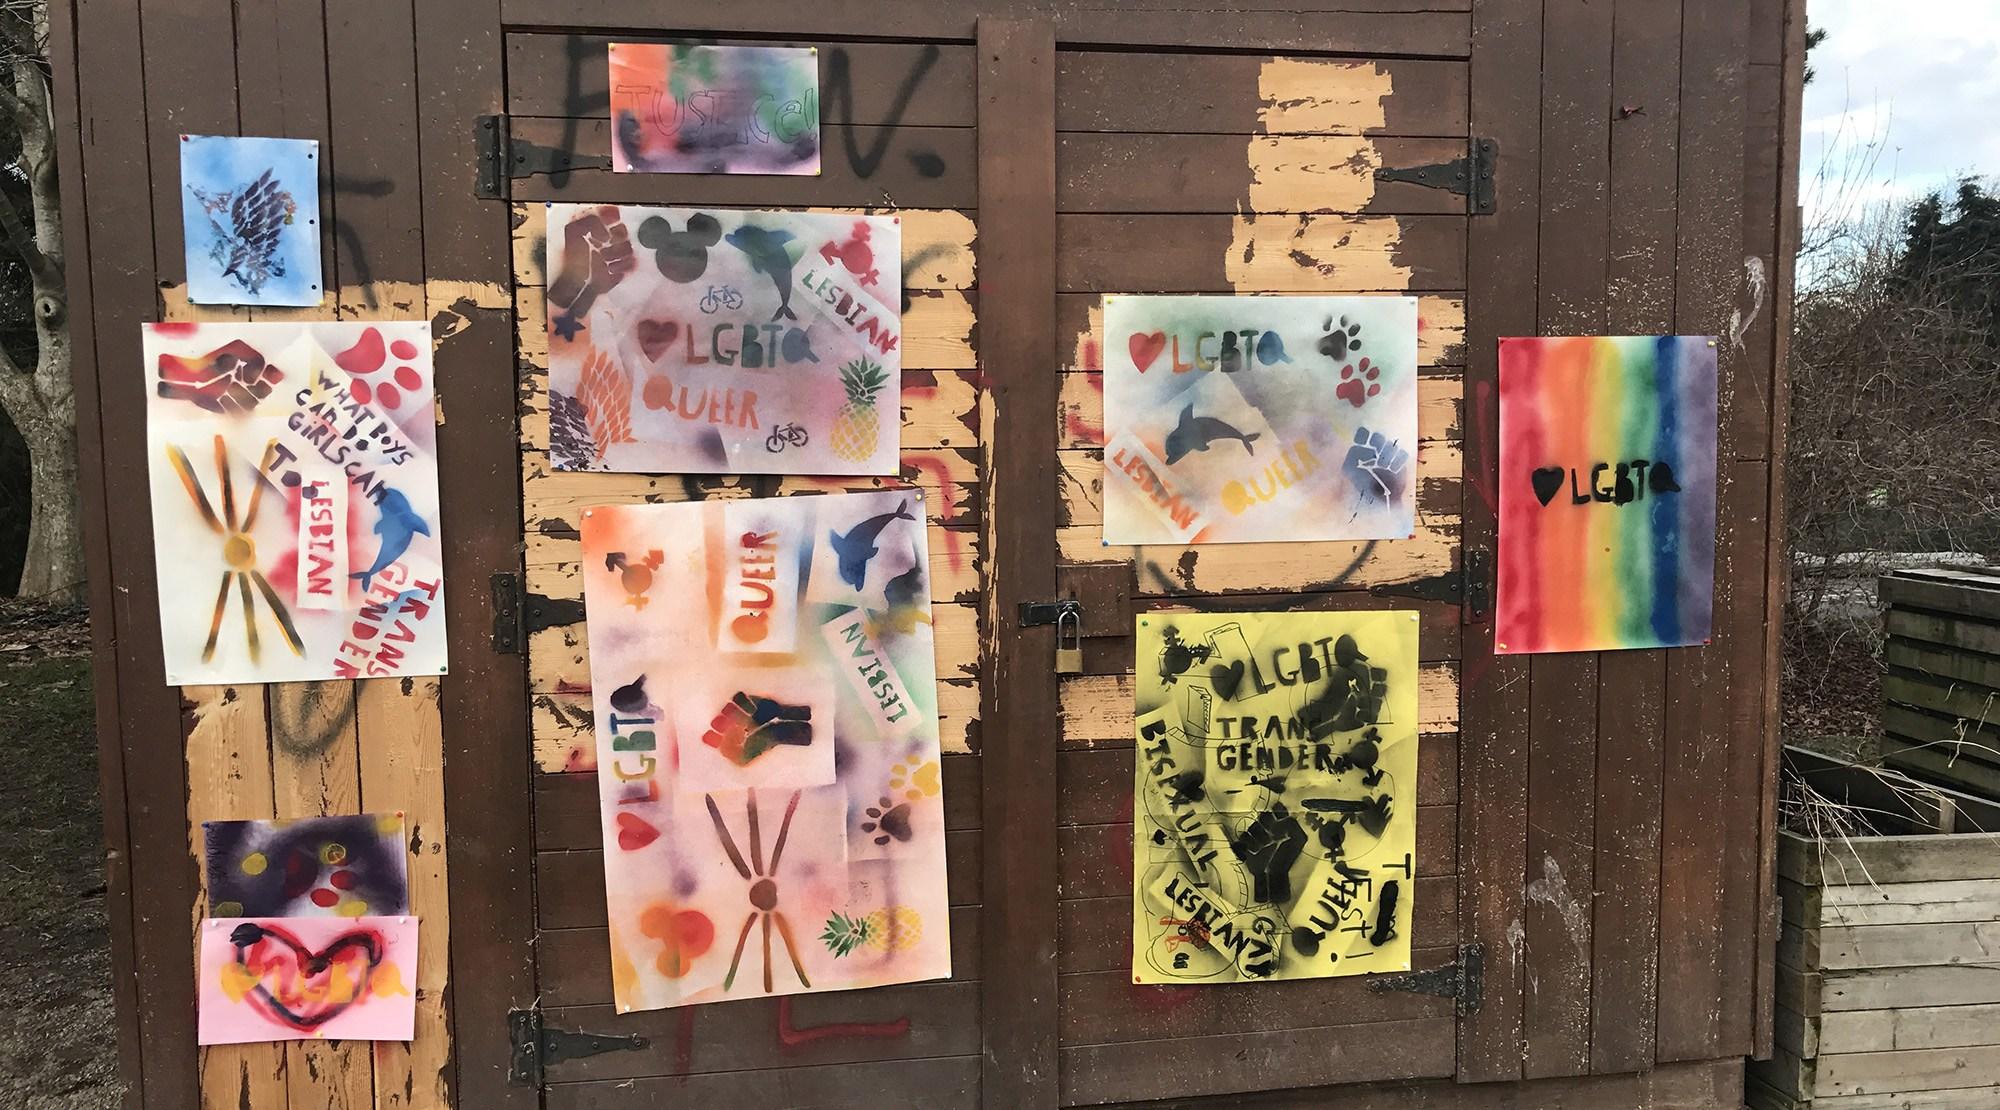 False Creek Elementary students take on Nazi graffiti vandals (PHOTOS)